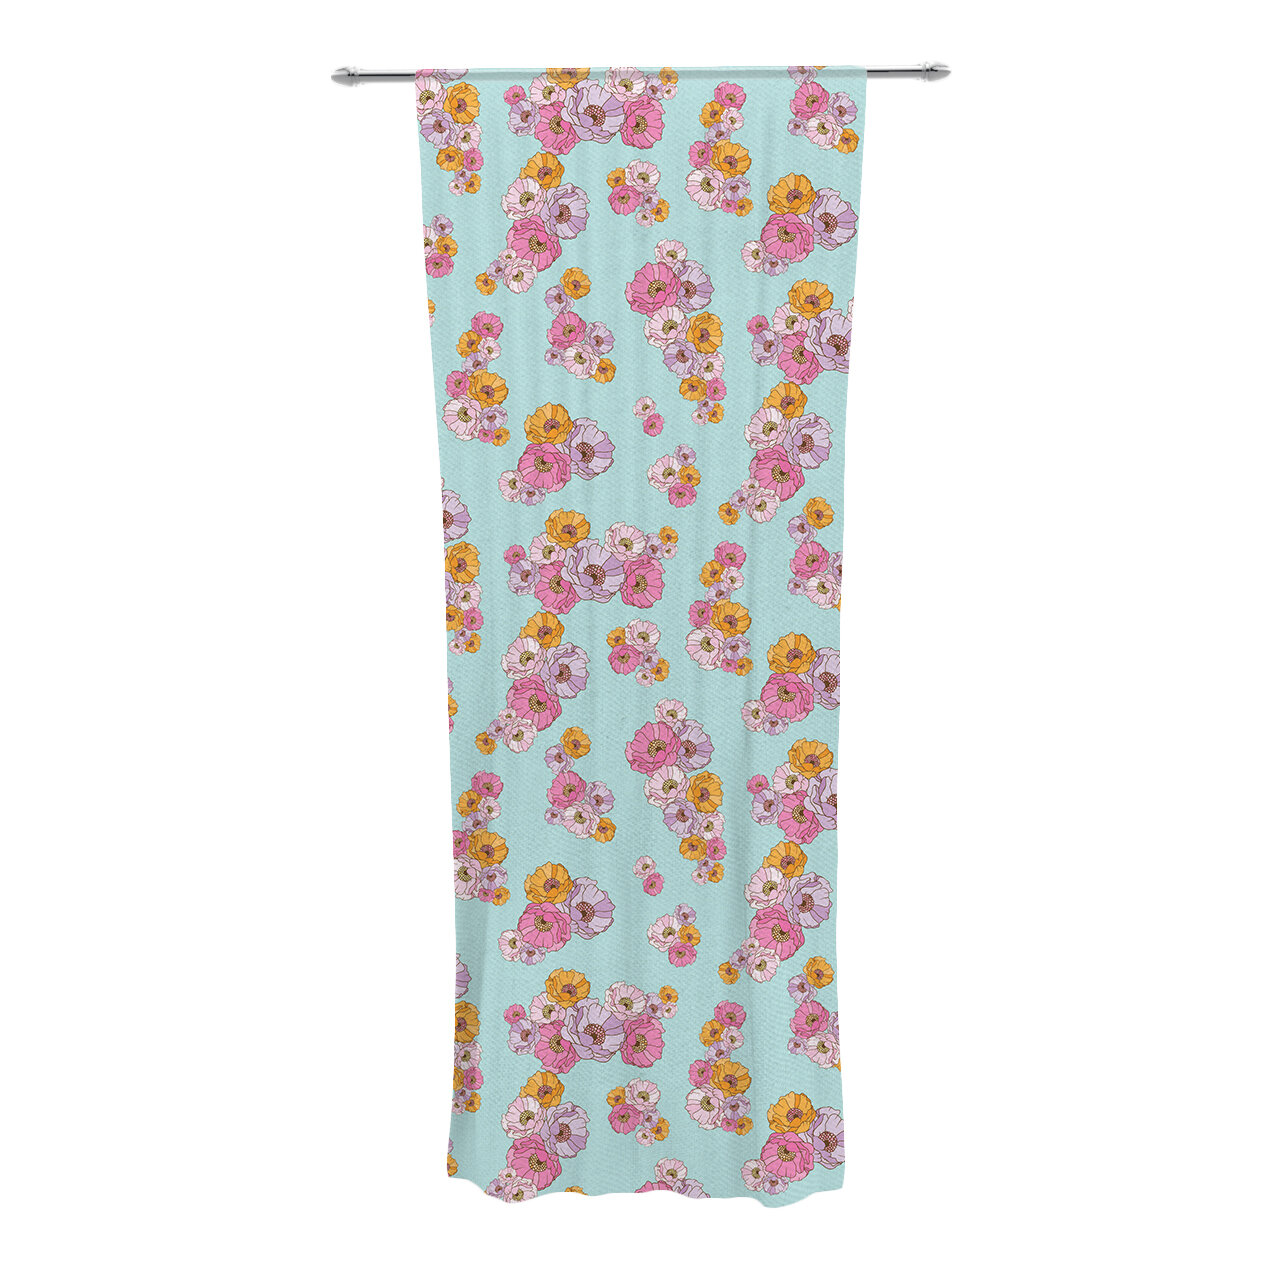 Kess Inhouse Paper Flower Nature Semi Sheer Curtain Panels Wayfair